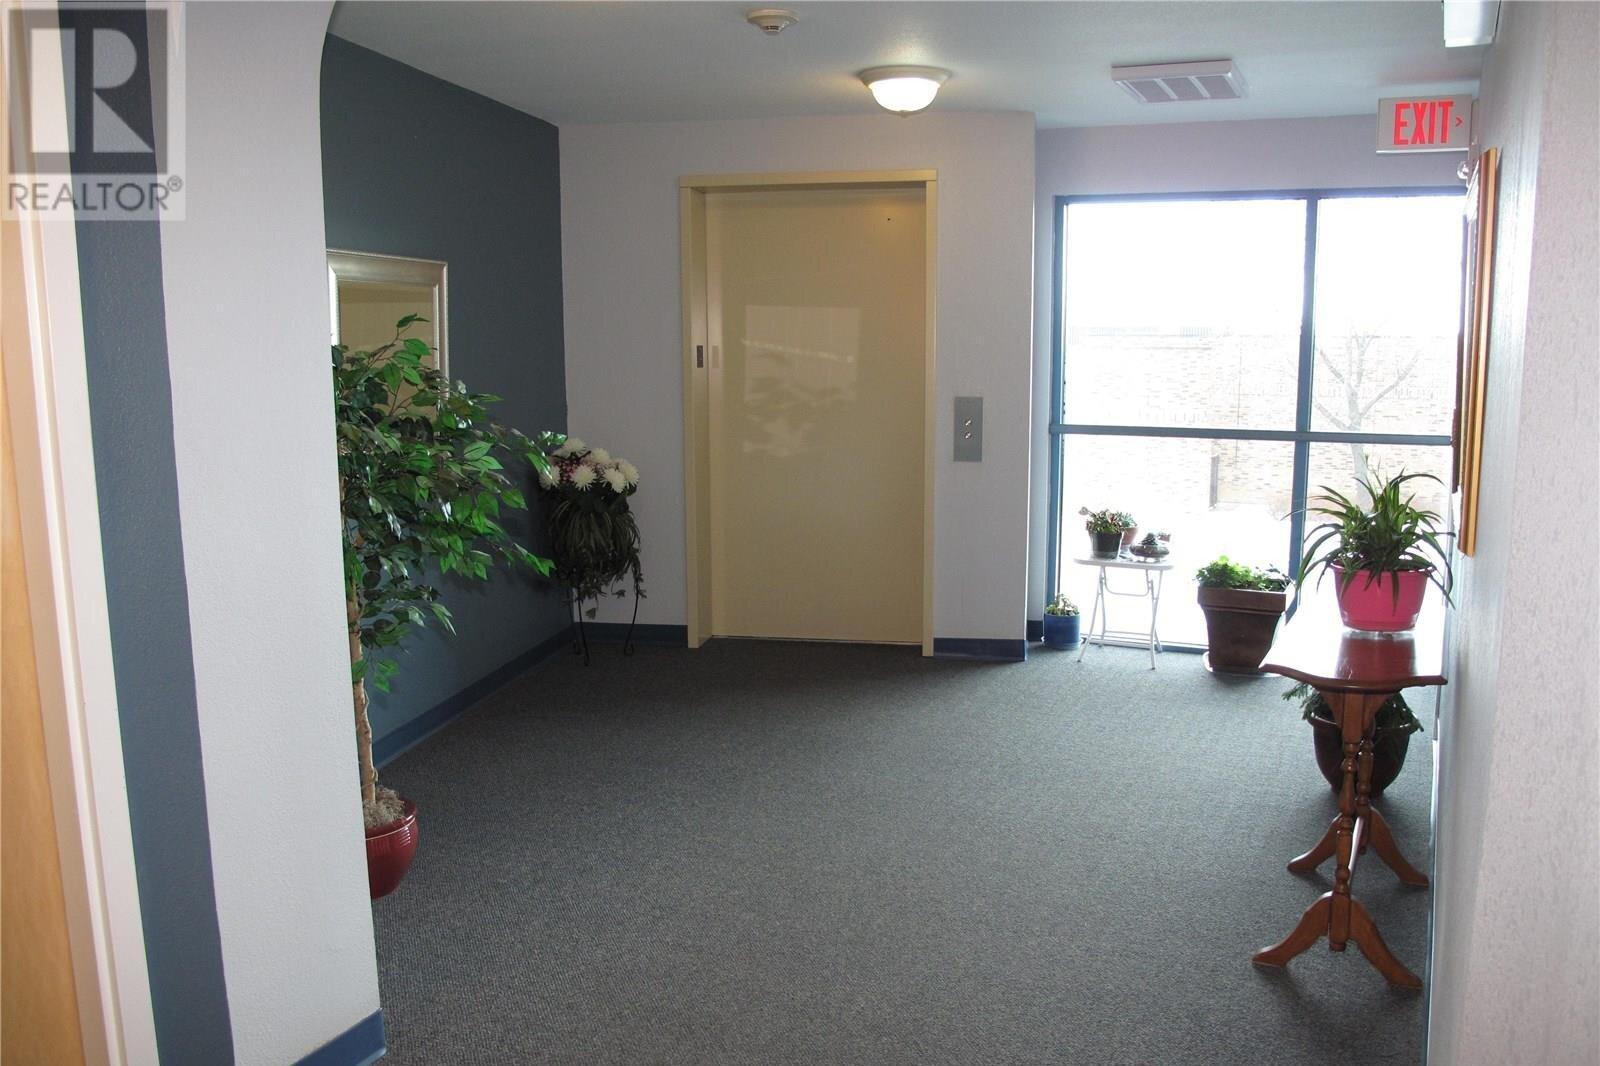 Condo for sale at 75 Souris Ave Unit 206 Weyburn Saskatchewan - MLS: SK831996